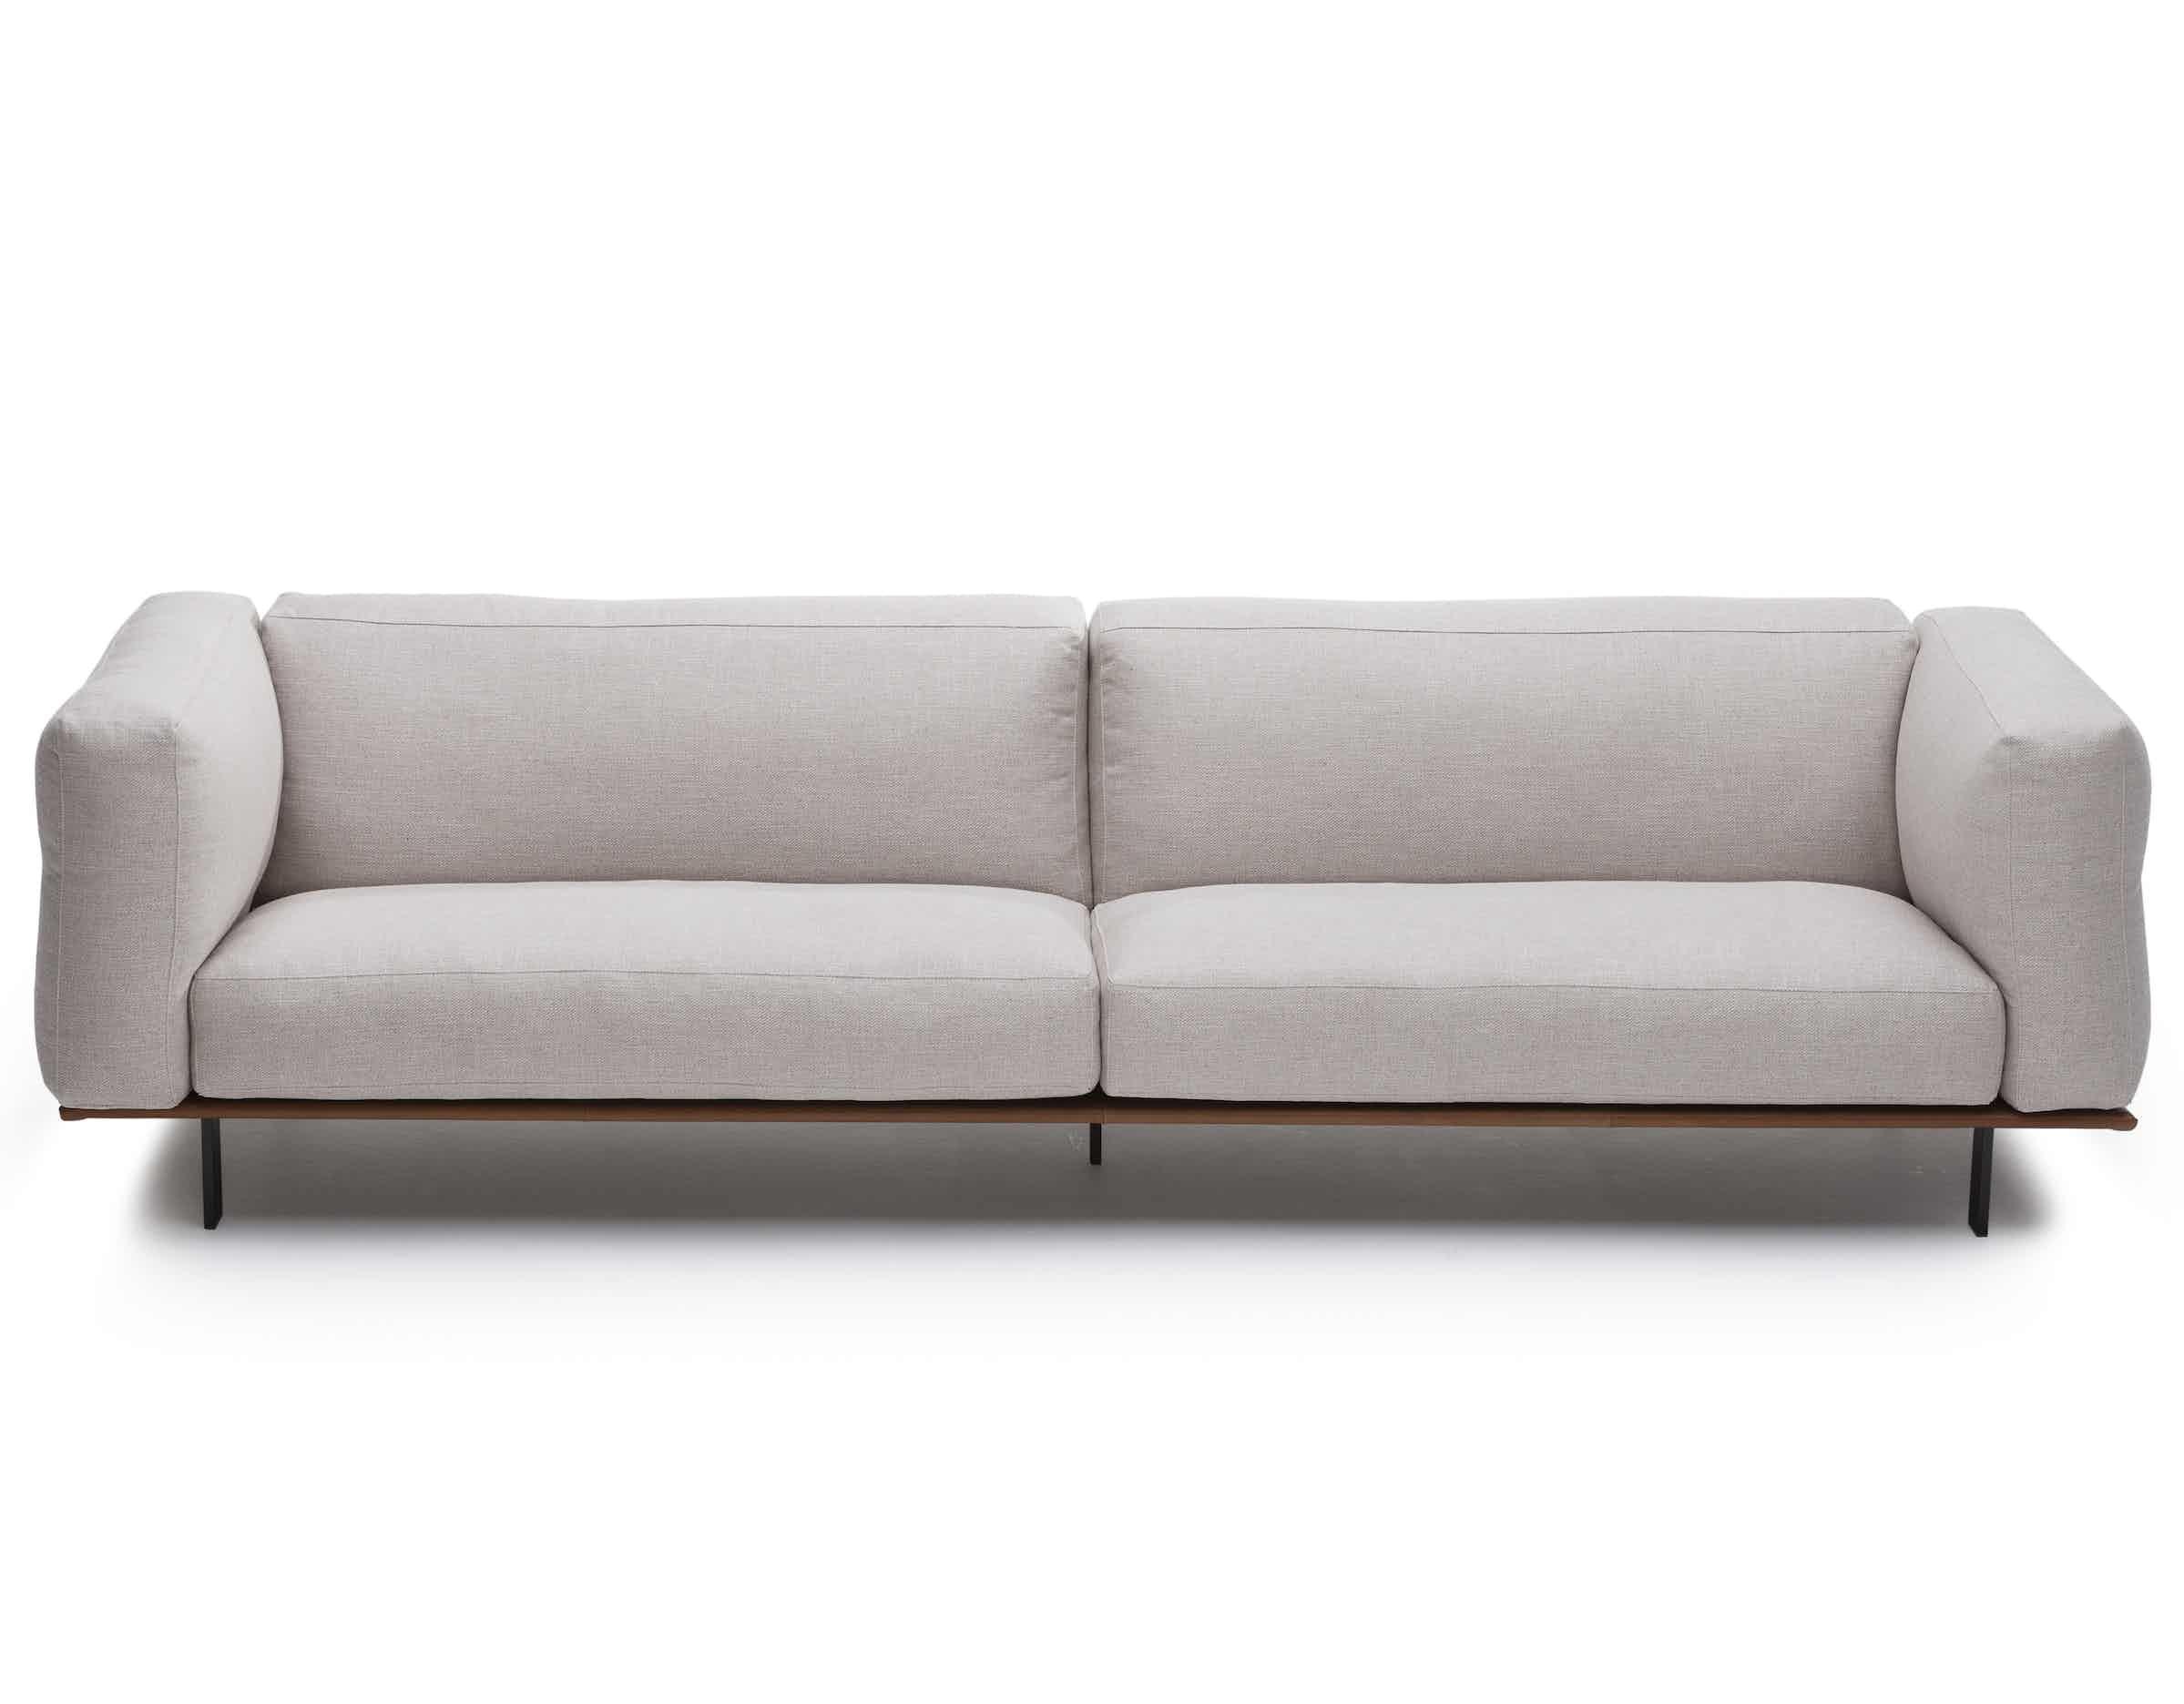 Linteloo-front-recess-sofa-haute-living